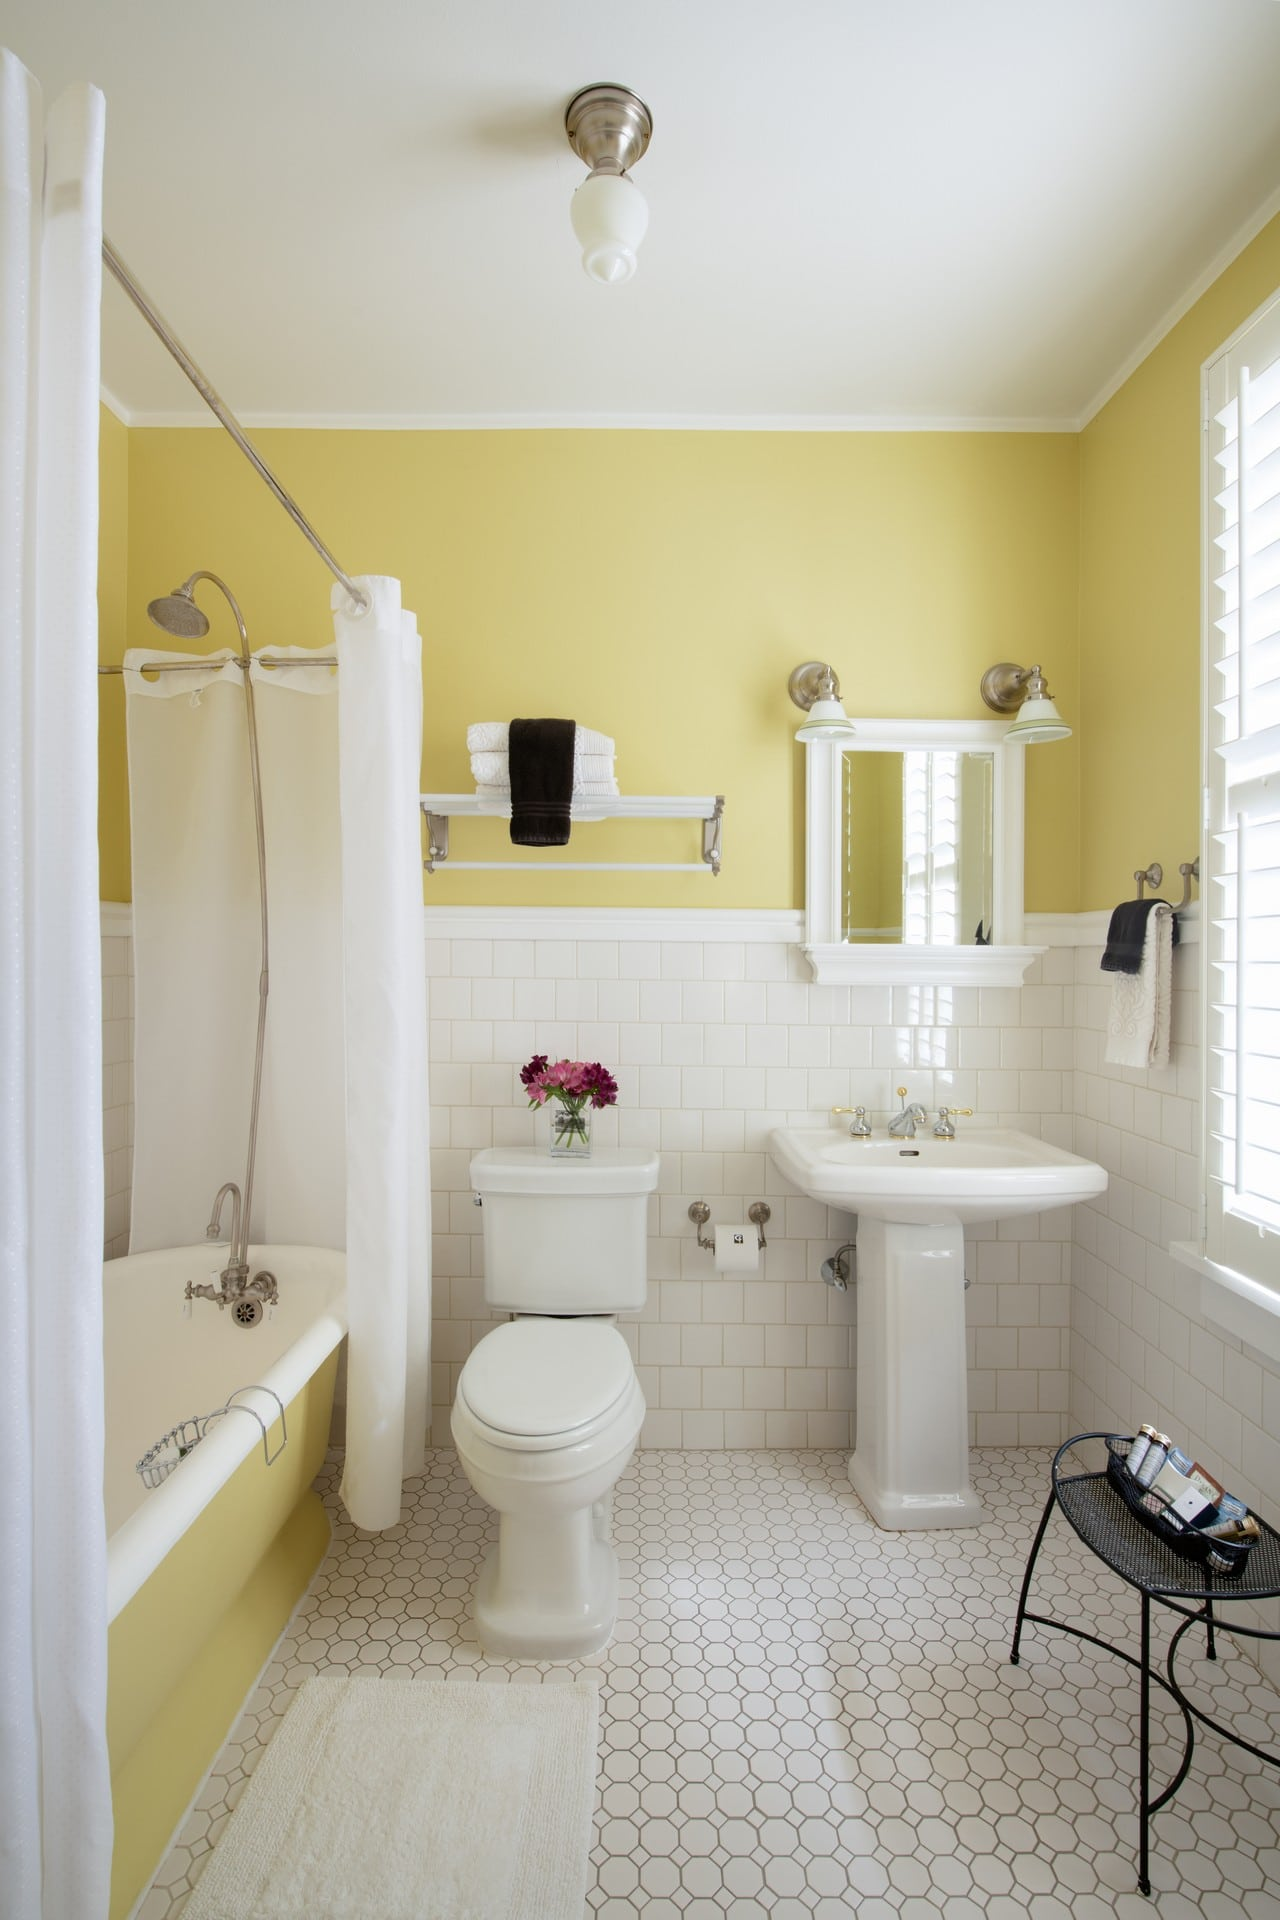 Beautifully tiled bathroom at the Chamberlin inn